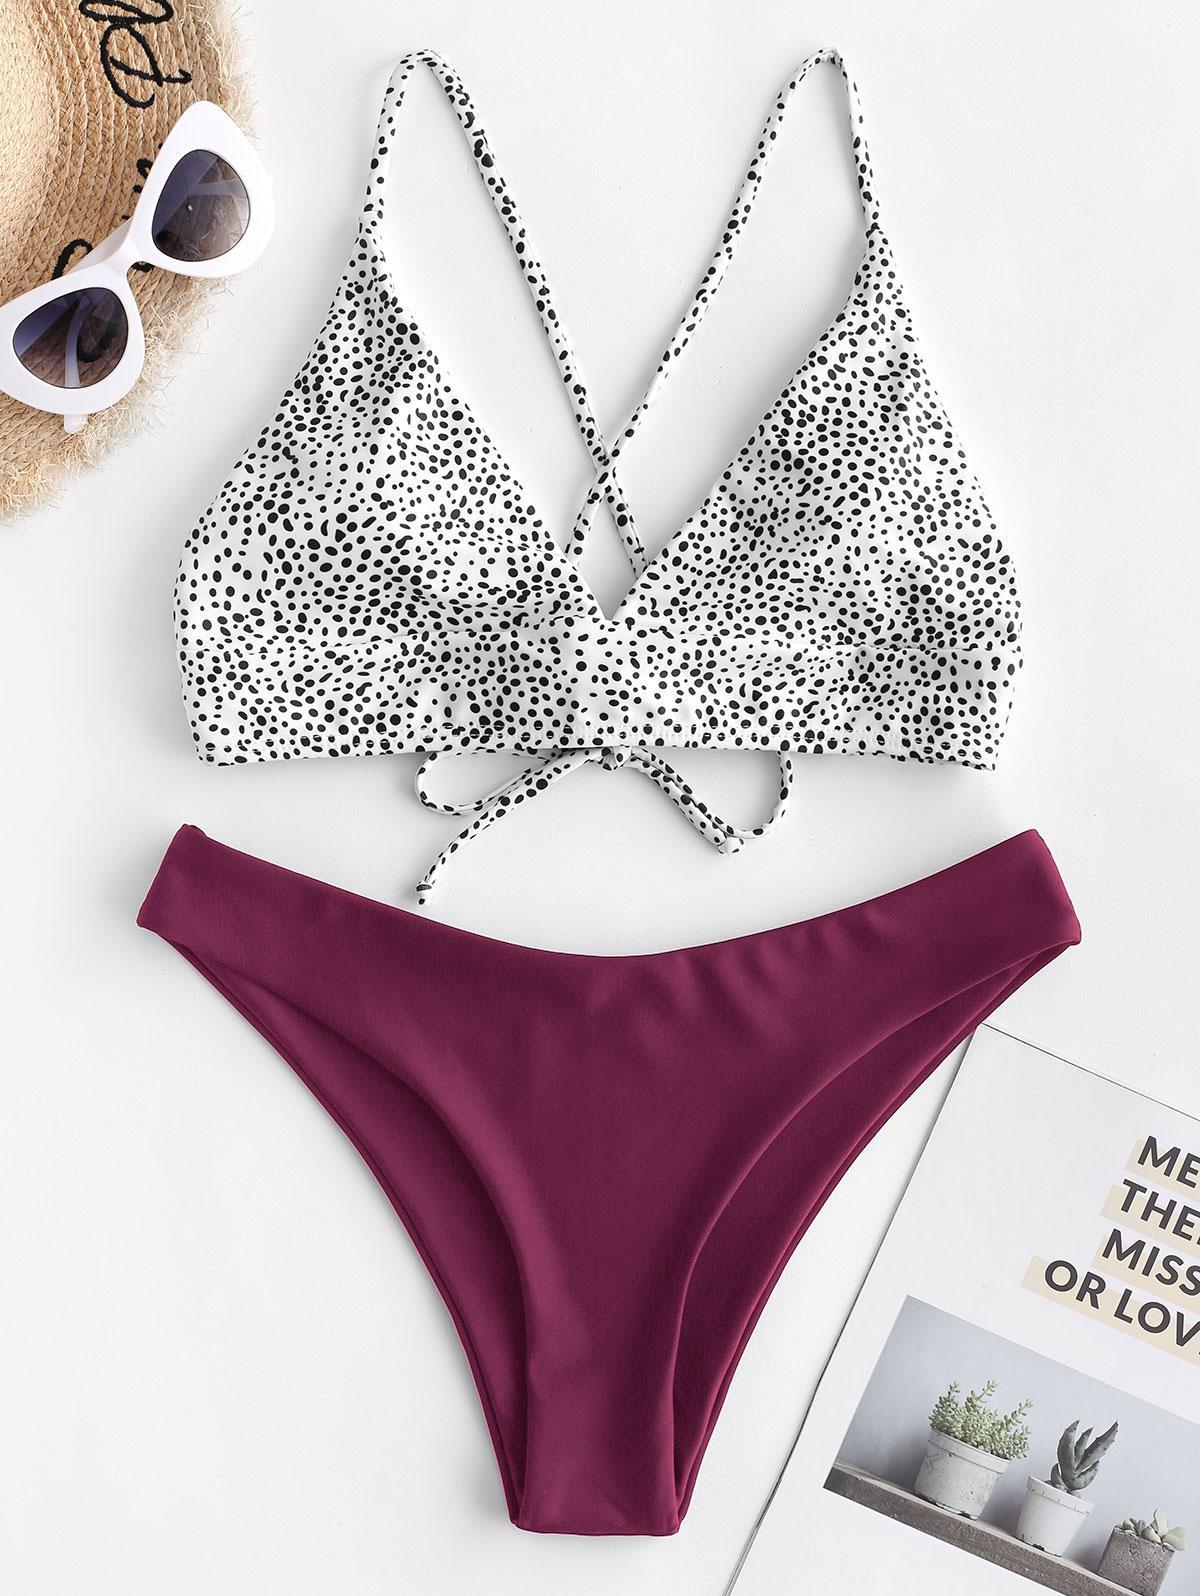 ZAFUL Dalmatian Dot Crisscross High Leg Bikini Swimsuit фото